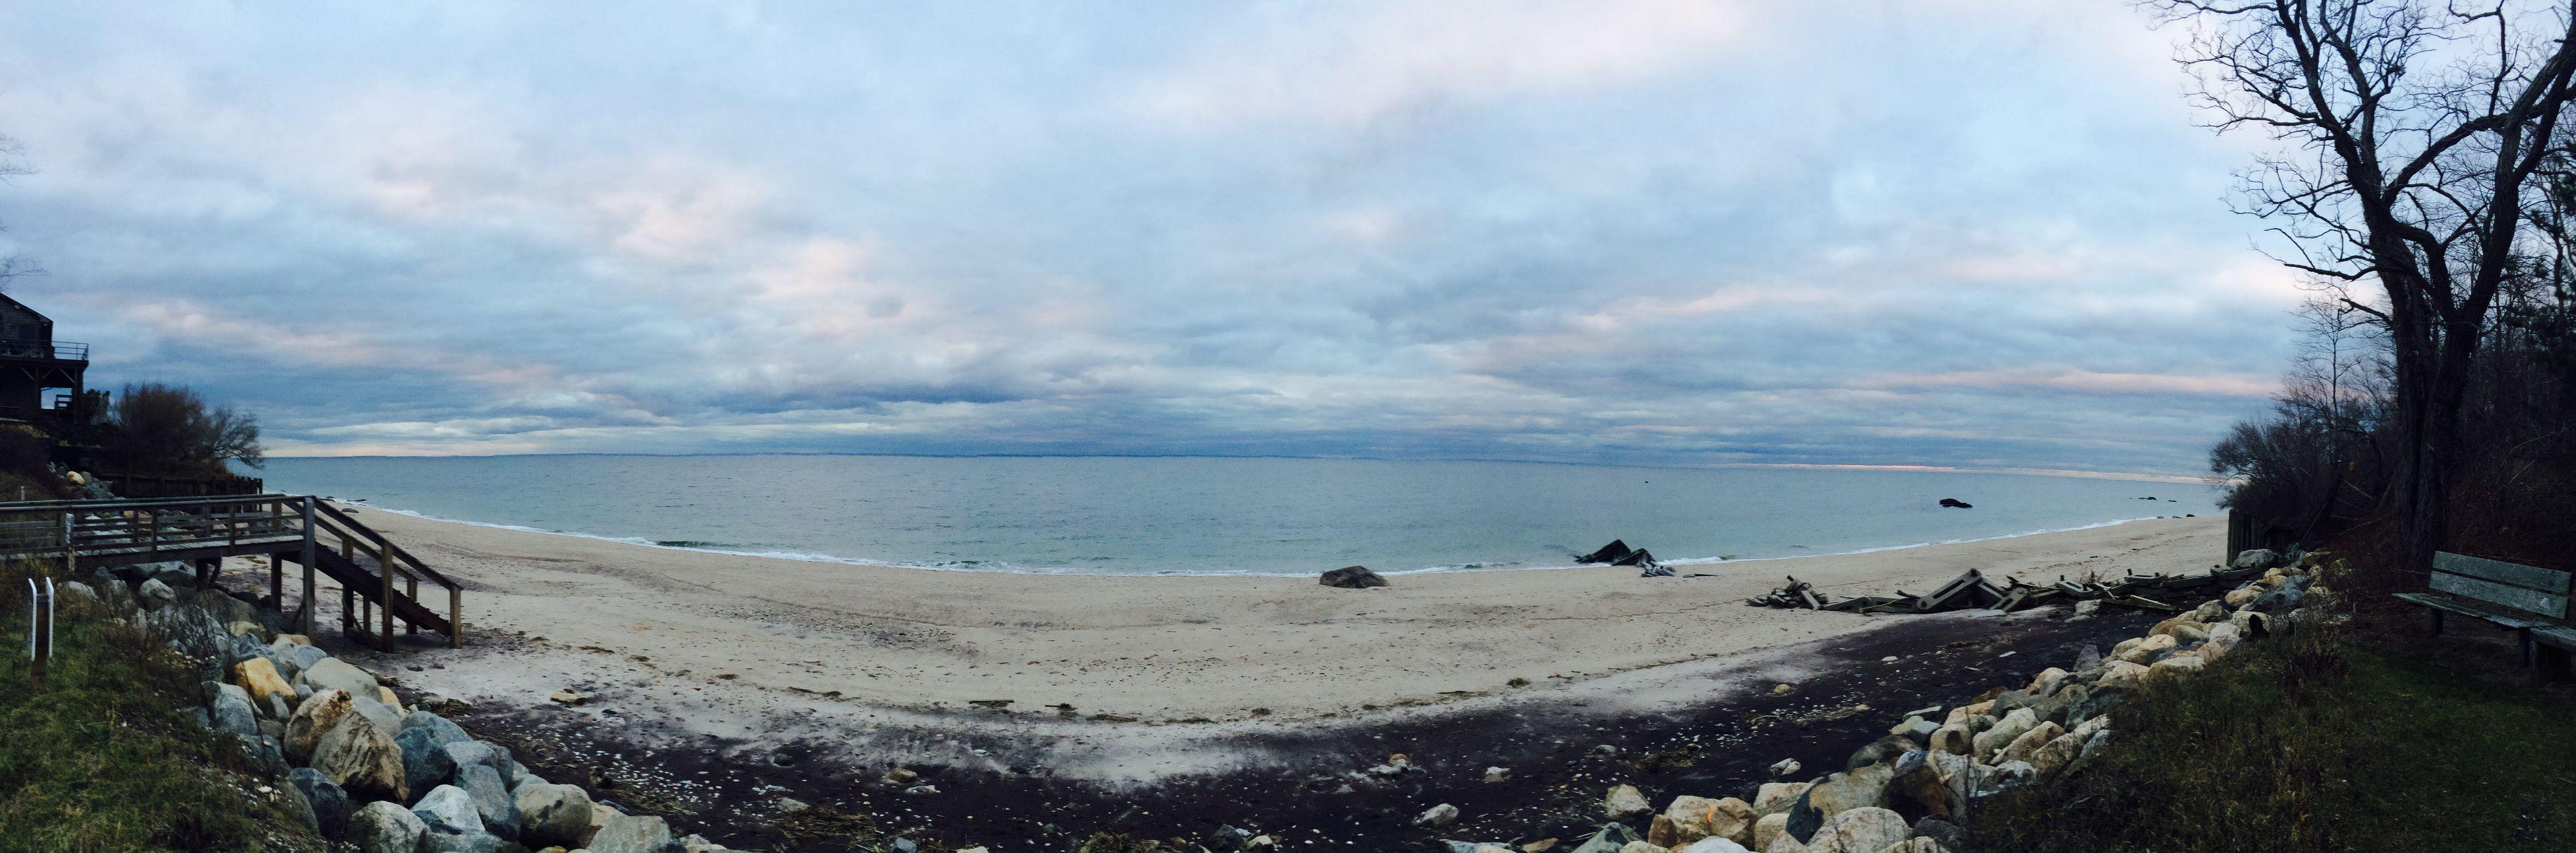 sea, sky, horizon over water, beach, water, tranquil scene, tranquility, scenics, shore, beauty in nature, cloud - sky, nature, sand, cloudy, idyllic, cloud, coastline, tree, calm, non-urban scene